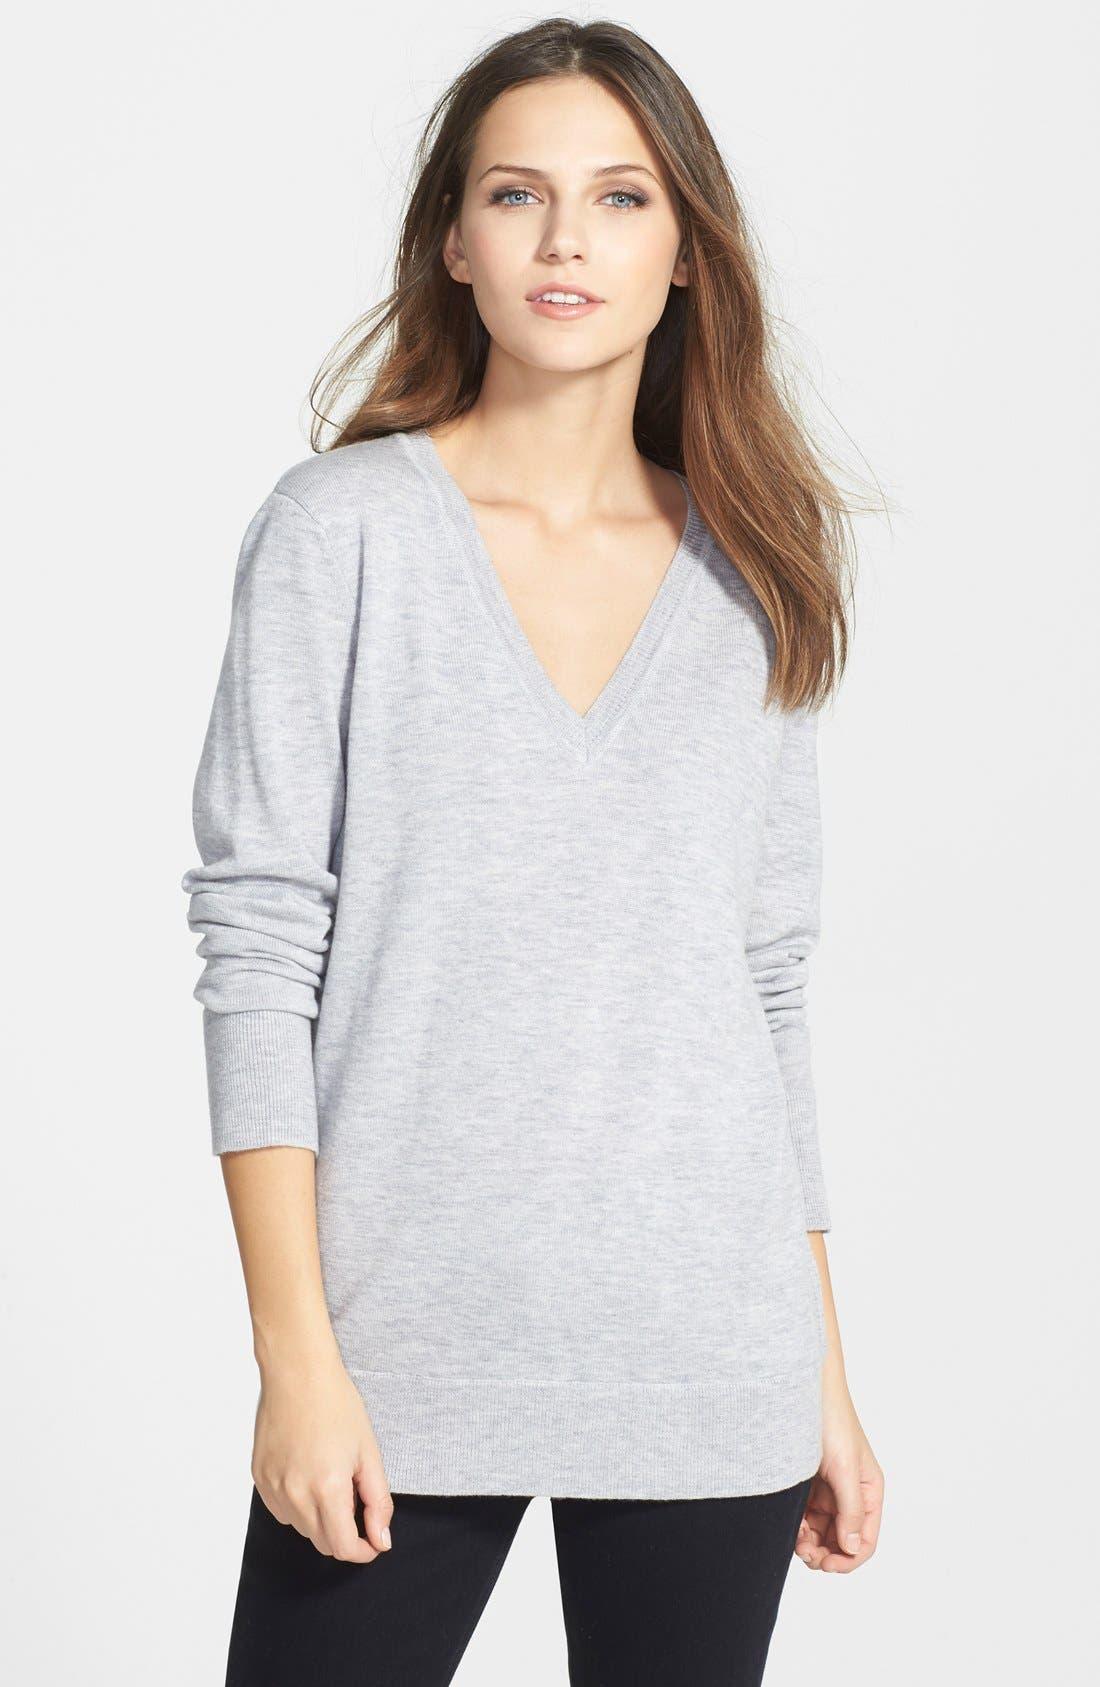 Main Image - rag & bone/JEAN 'Natalie' Merino Wool V-Neck Sweater